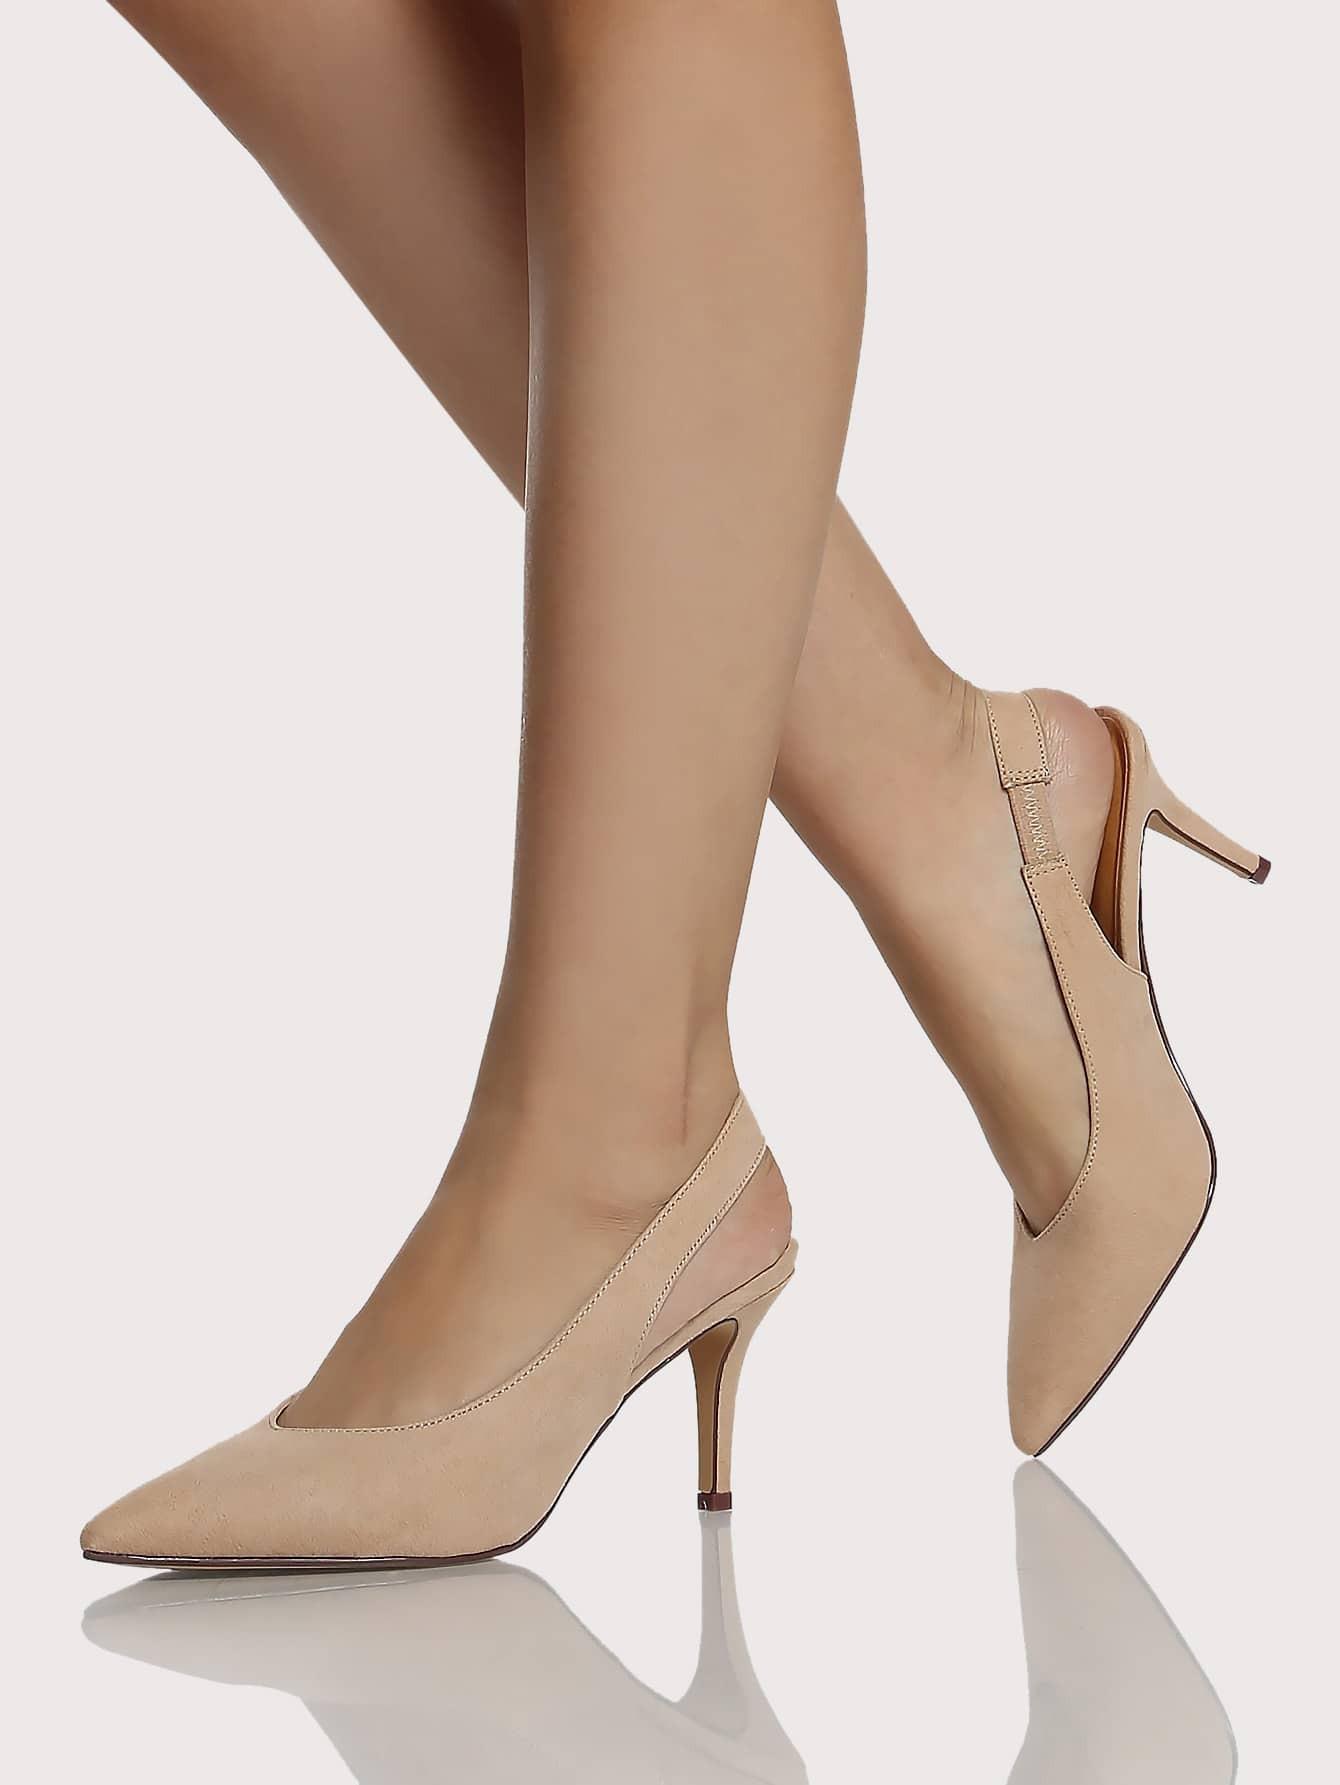 Pointy Toe Sling Back Pump Heels NUDE